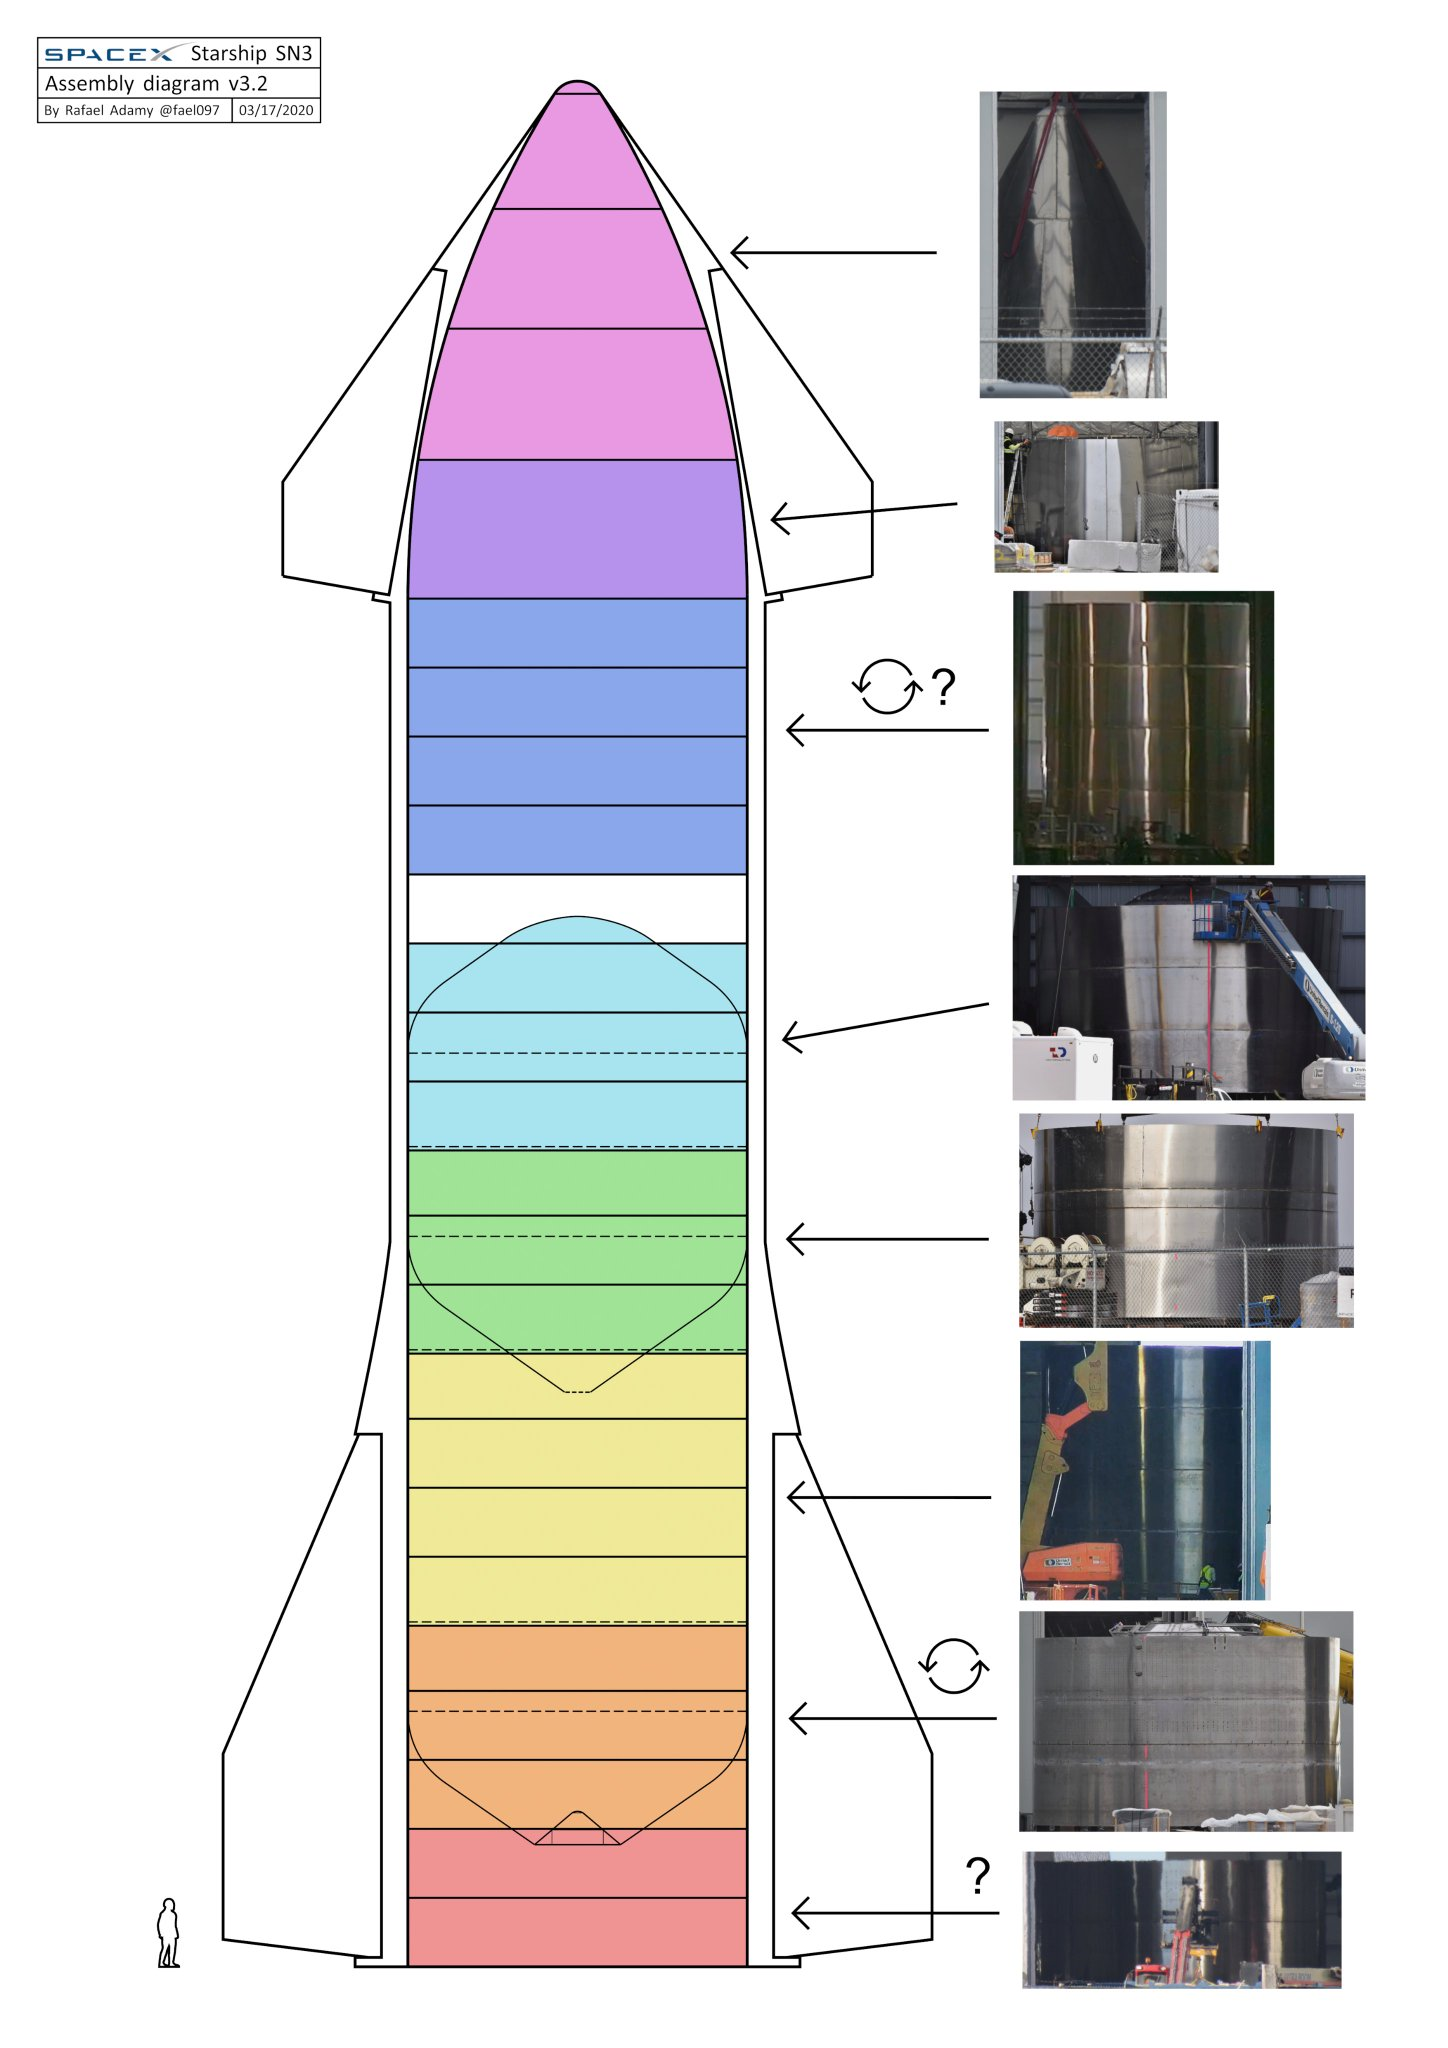 Starship SN3 (Boca Chica) [Echec] - Page 2 ETSNAE-XkAAOYjm?format=jpg&name=large